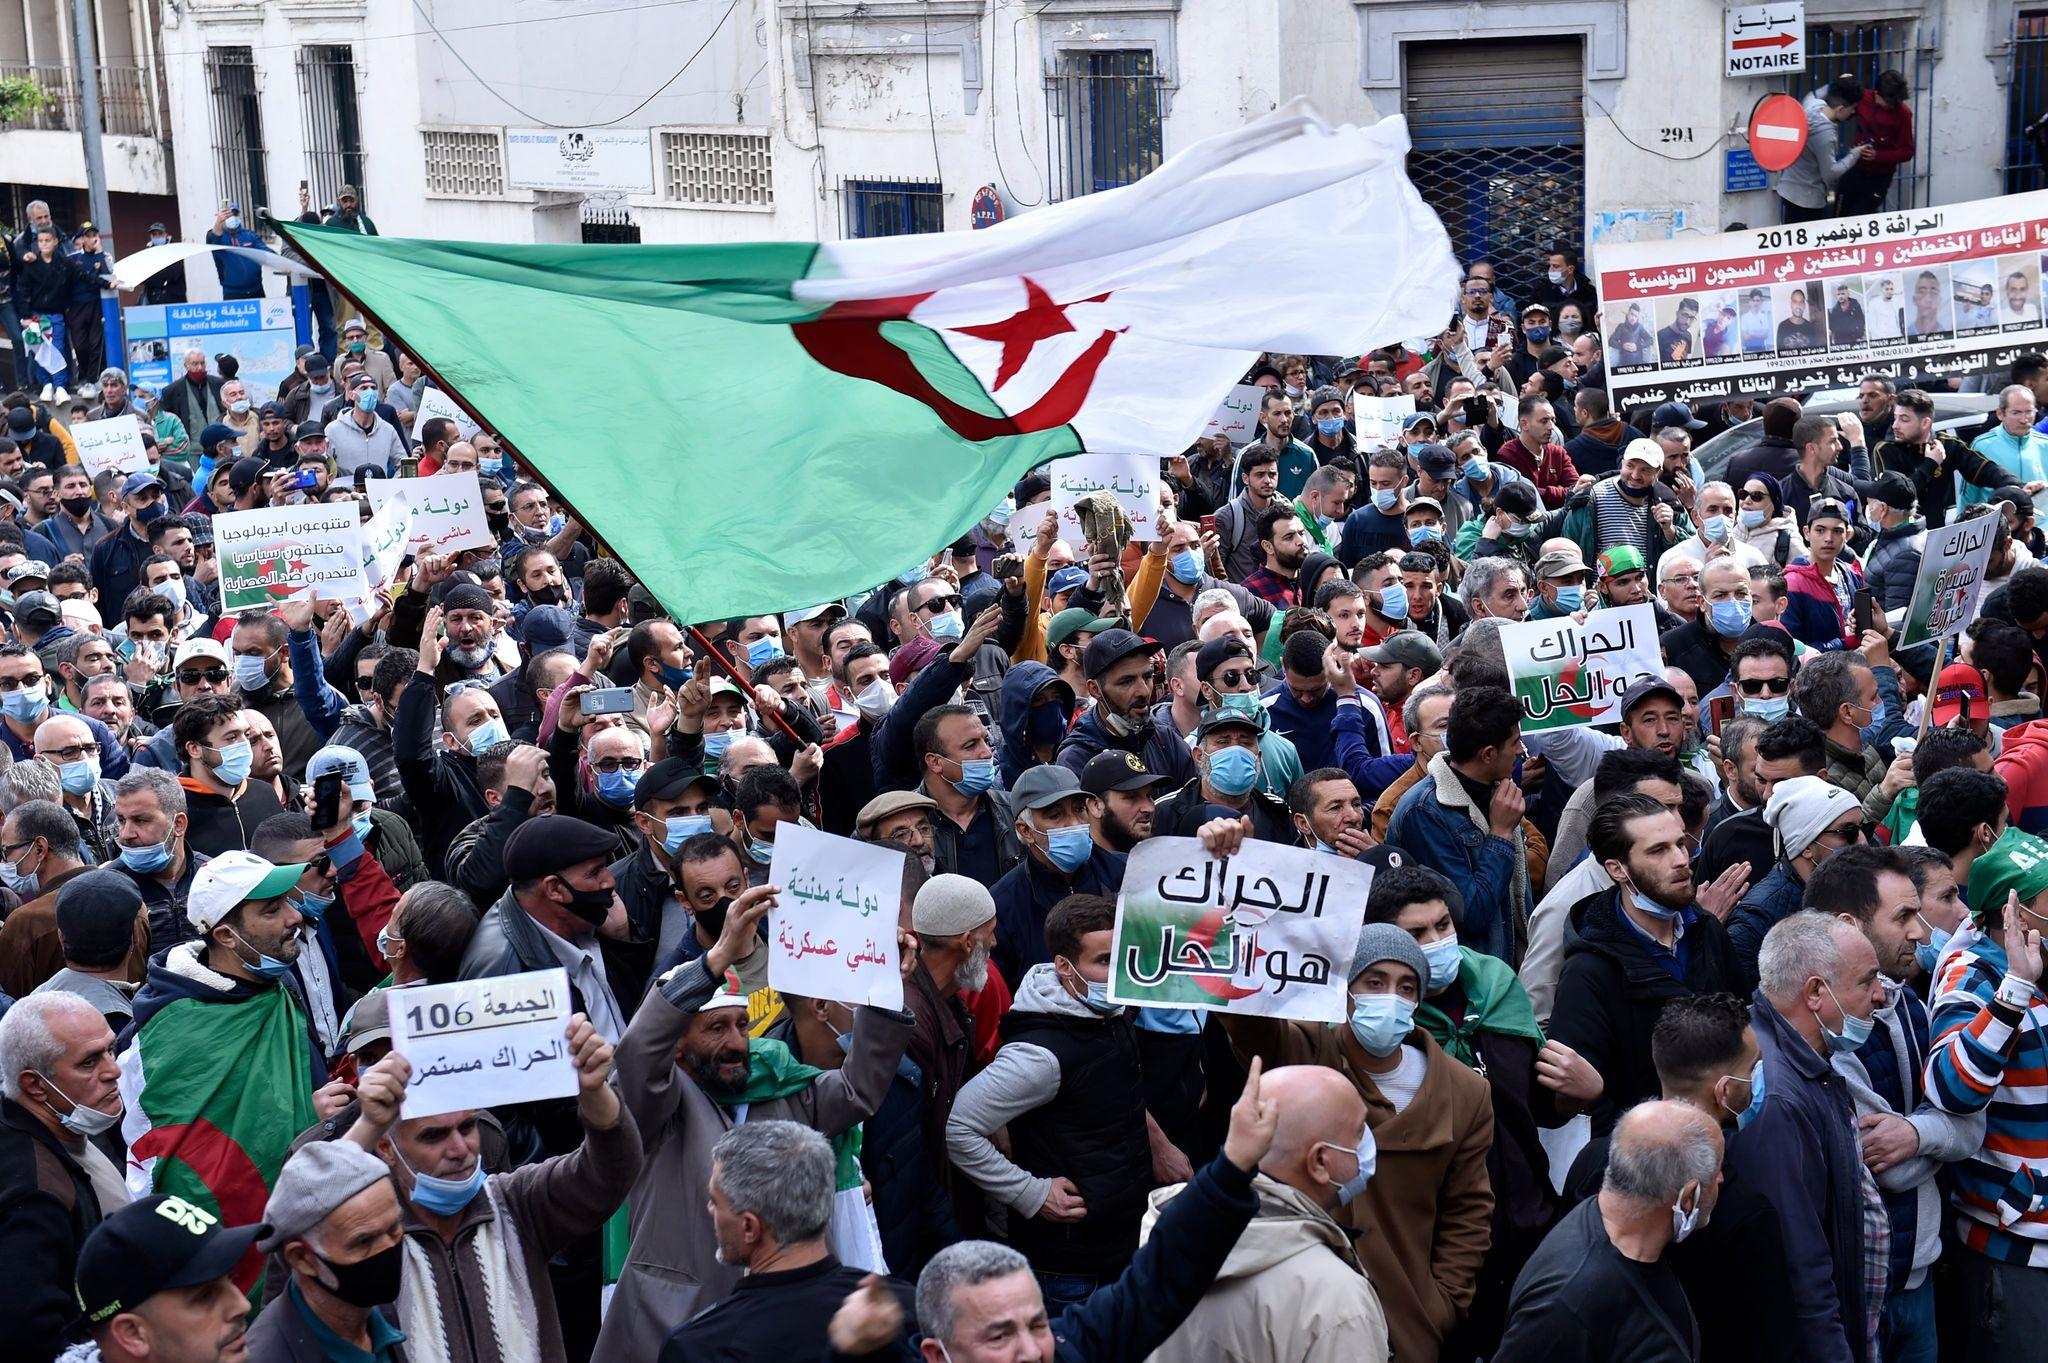 © Samir Sid   106e vendredi du hirak à Alger